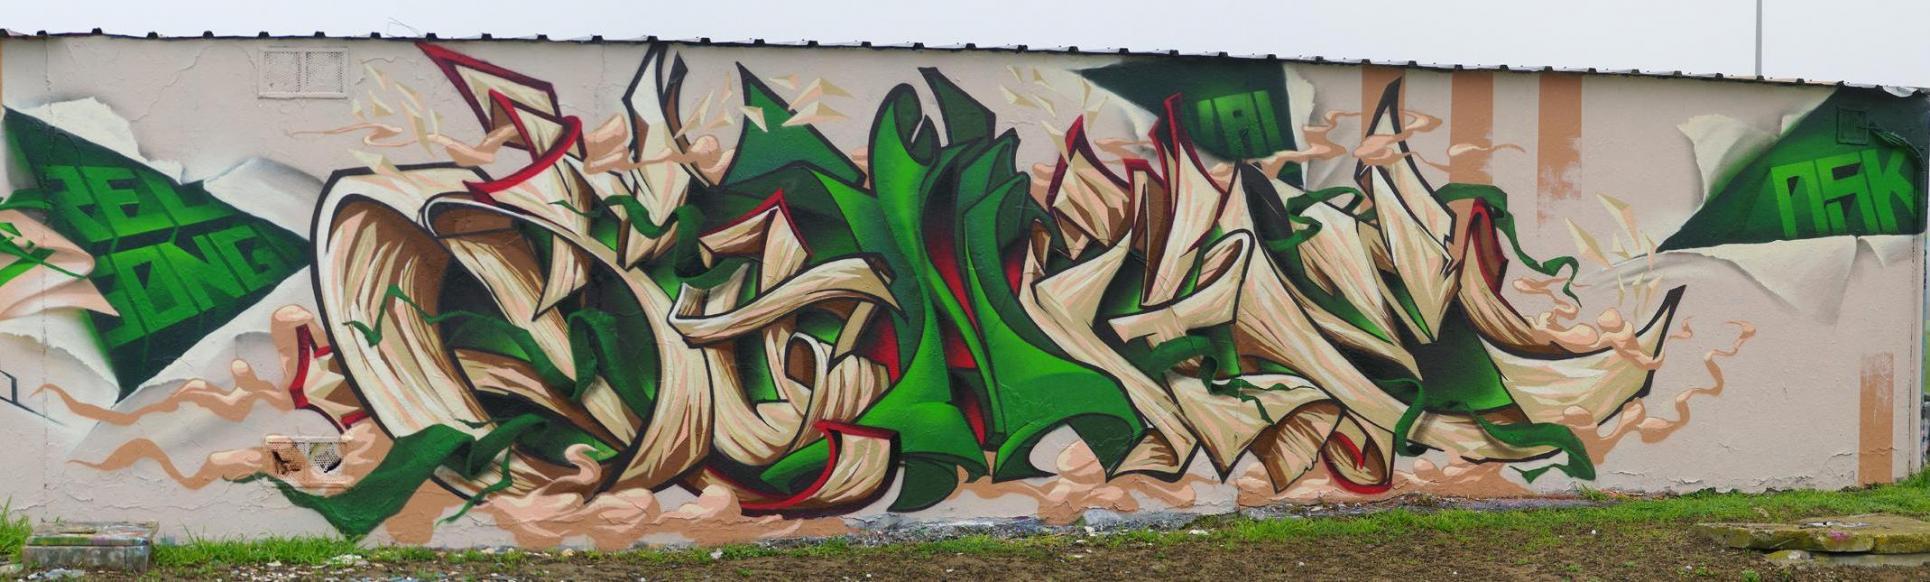 xun.fr-graffiti-session-by-couleurs-crews-c3p-dsk-h2o-imf-val-91-0000019640.jpg